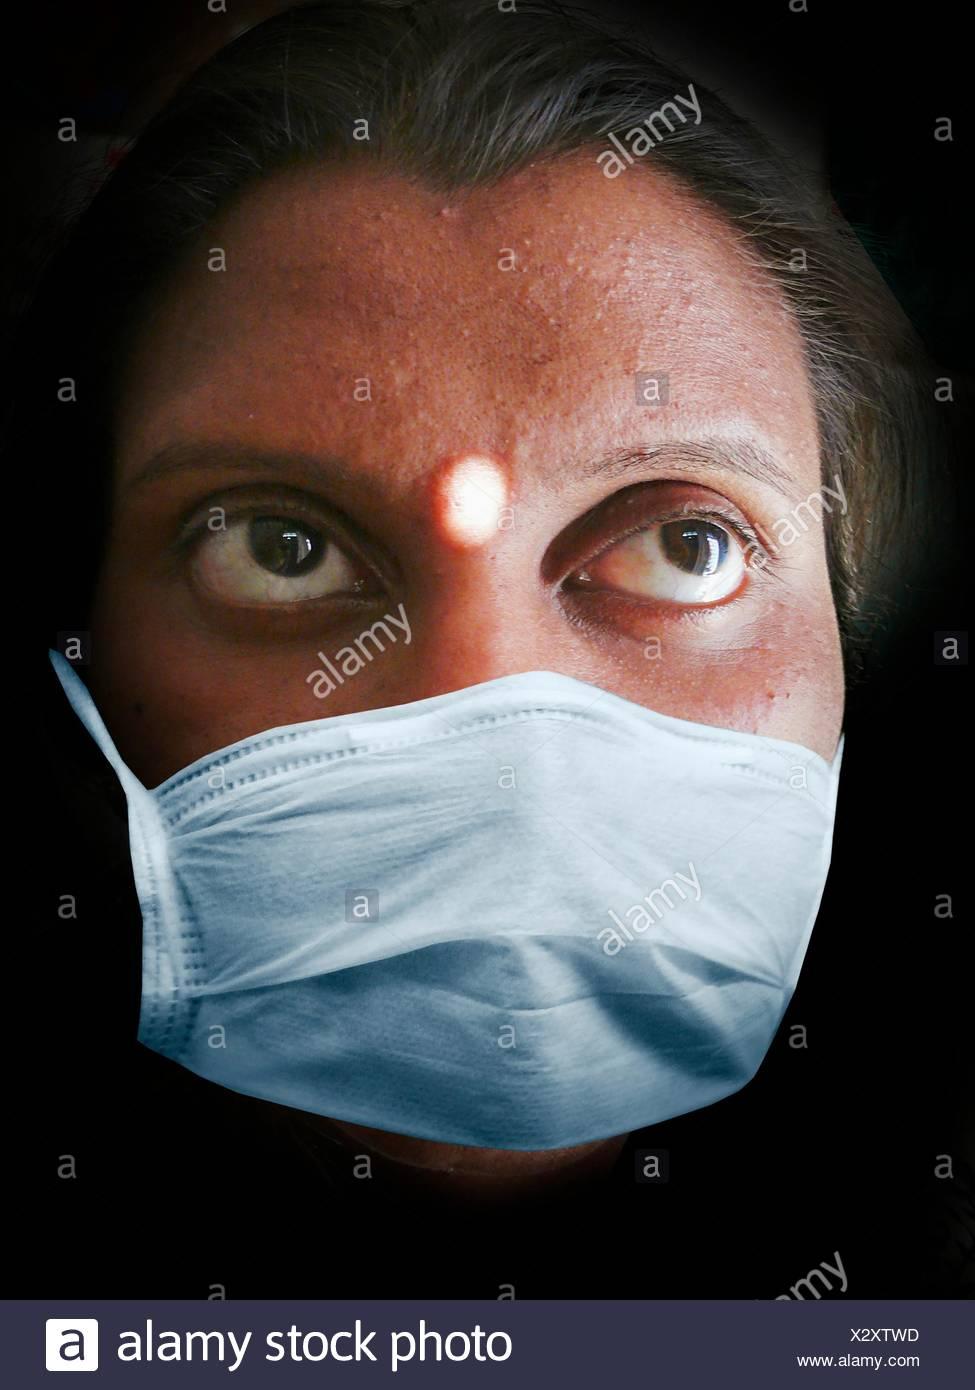 Woman, Precaution mask for Swine Flu, H1N1 Stock Photo